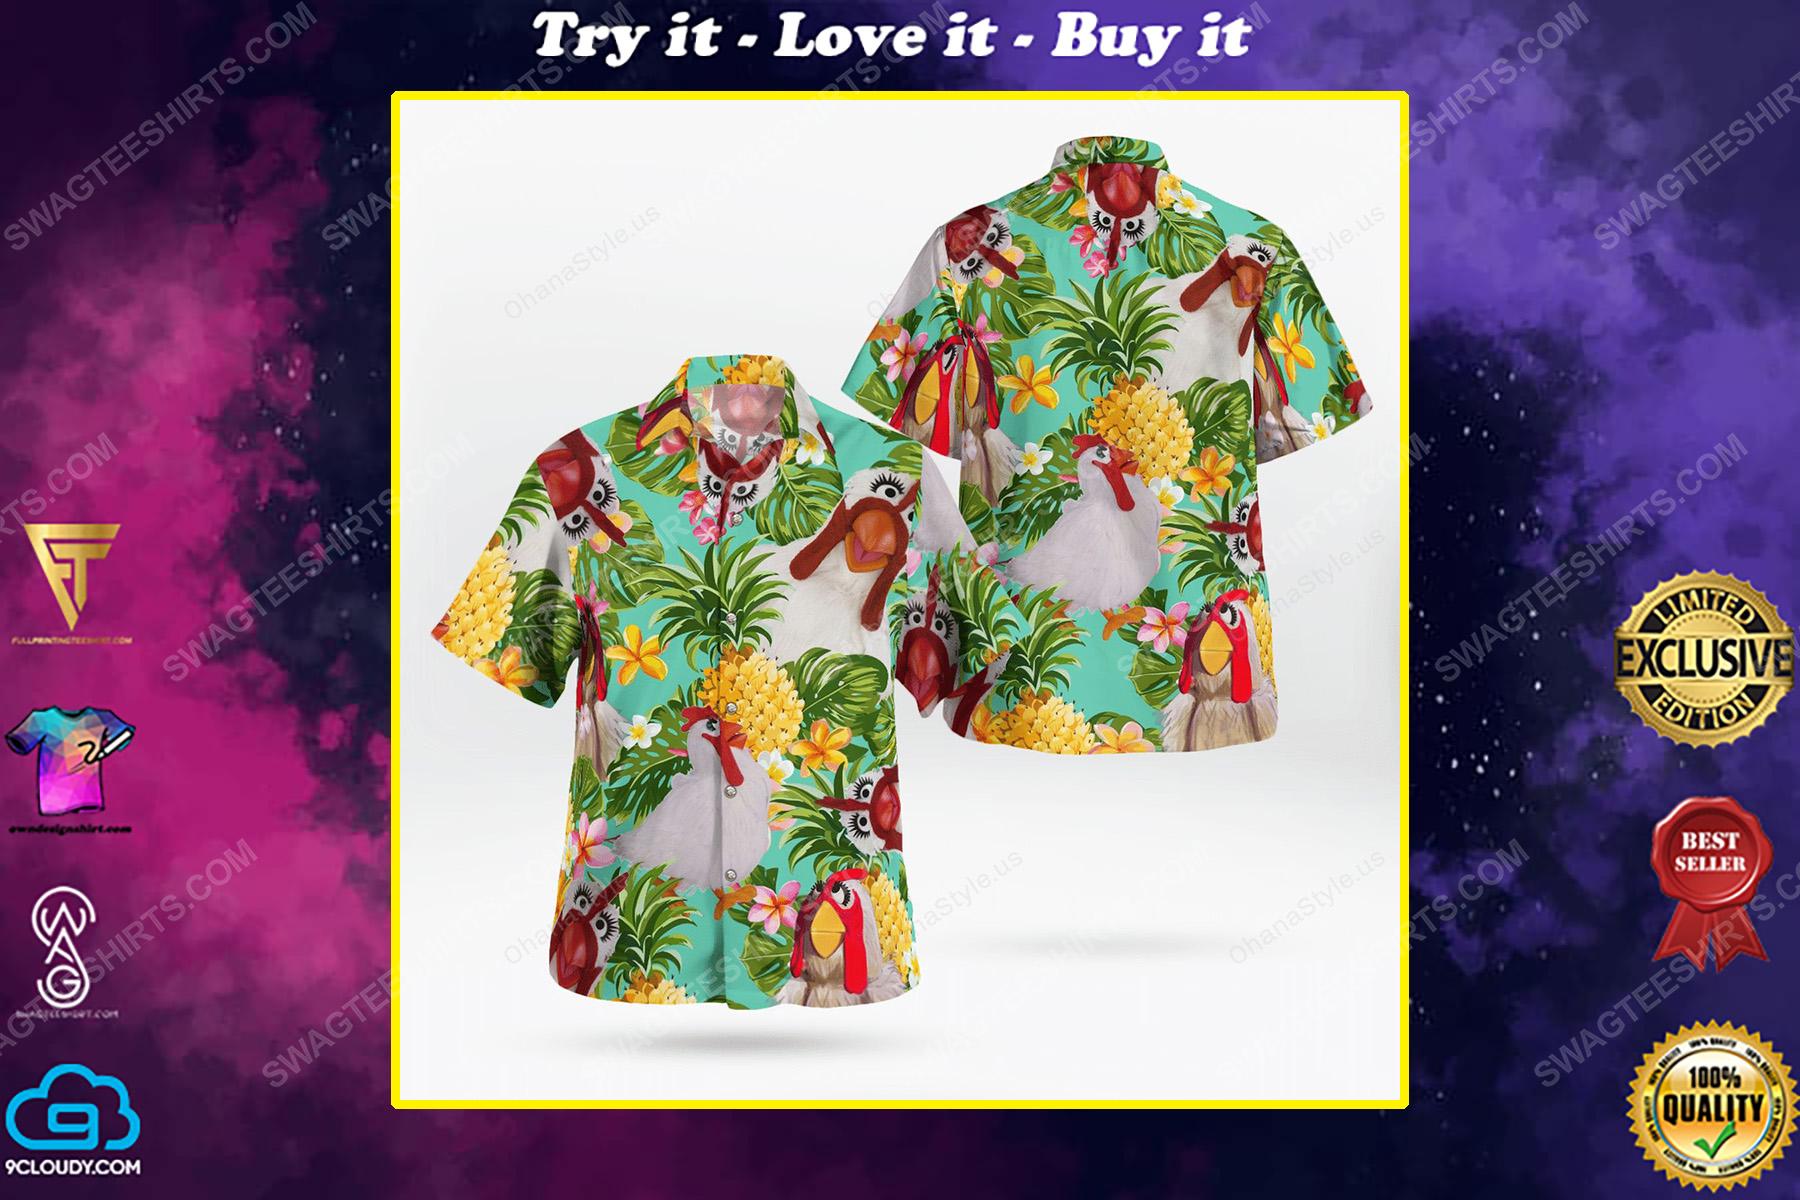 The muppet show camilla the chicken hawaiian shirt